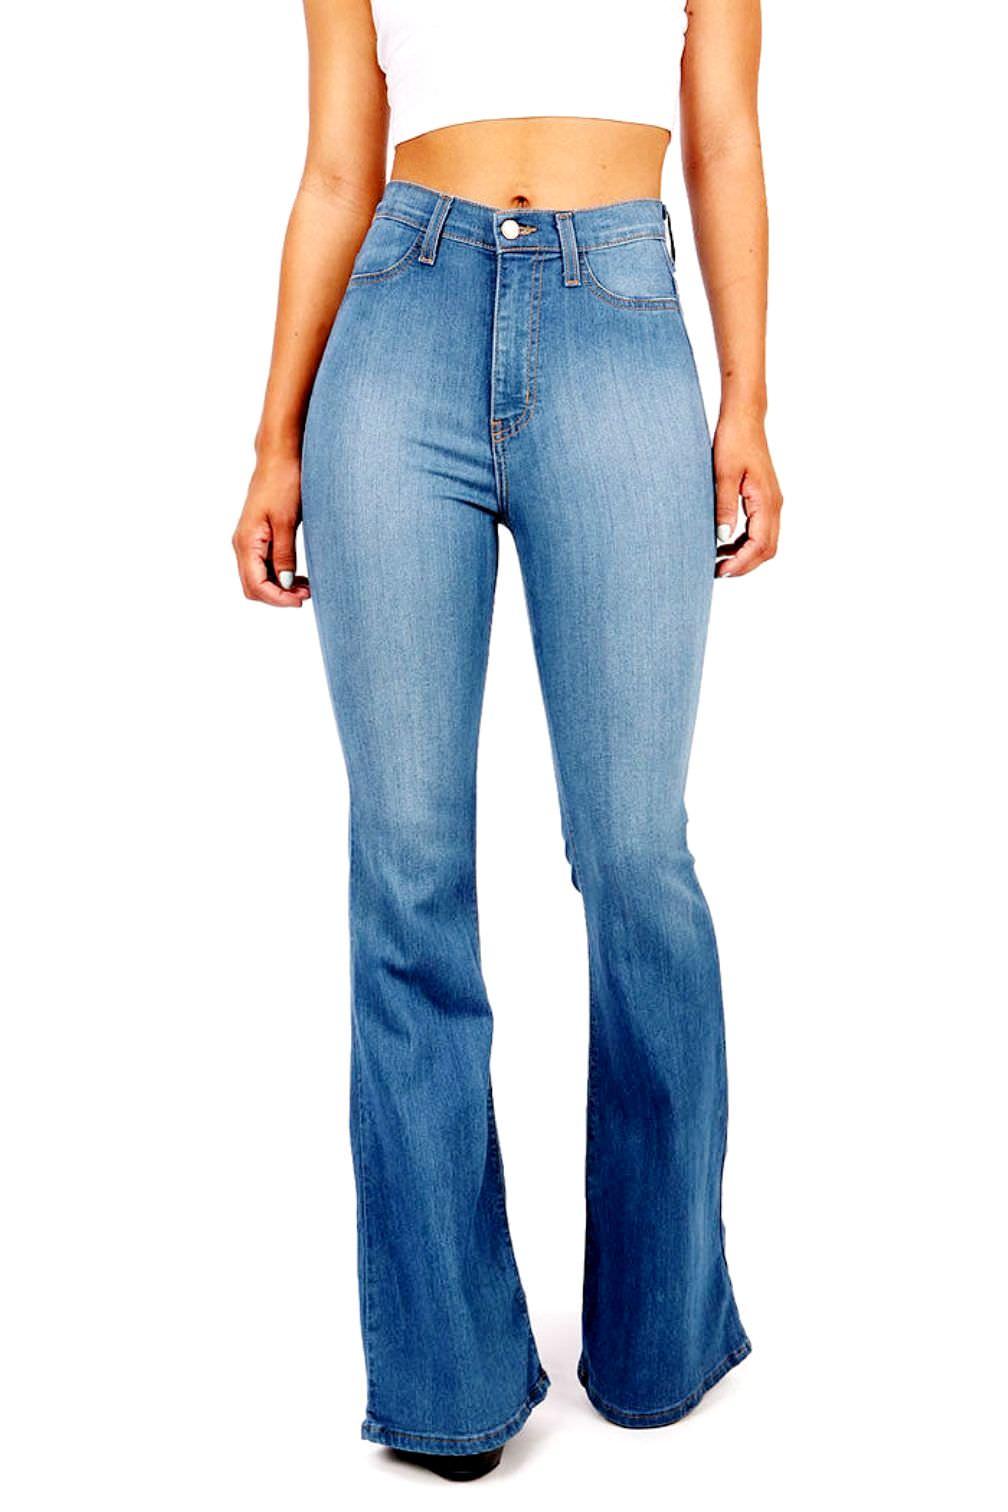 Jack David Vintage High Waist Womens Juniors 70s Trendy Slim Fit Asymmetric Tassel Slit Flared Bell Bottom Denim Jeans Pants